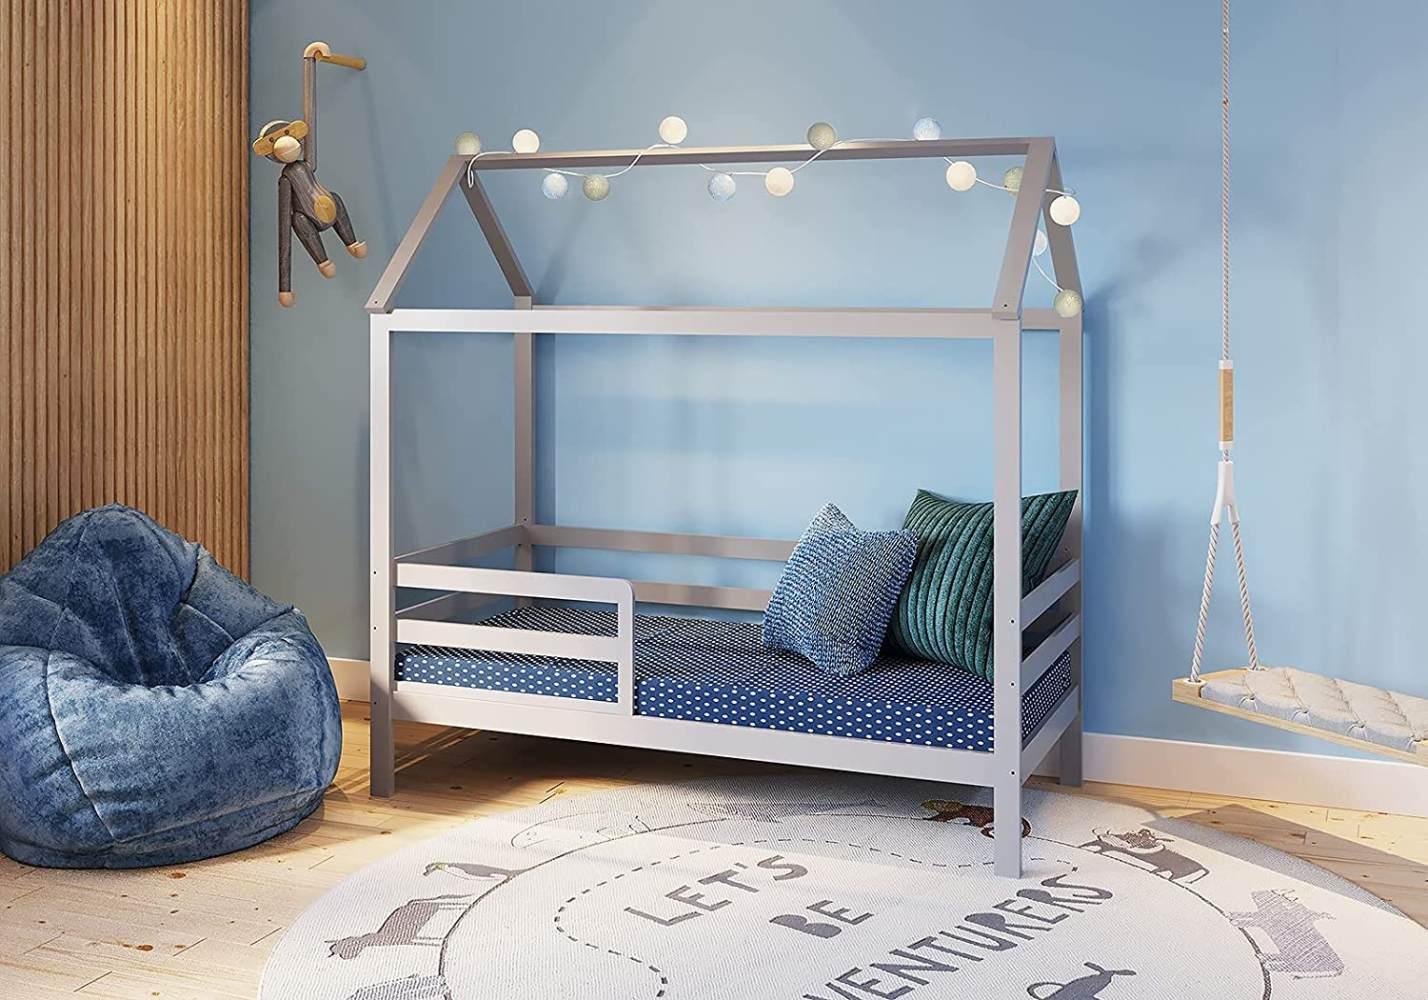 FabiMax 'Schlummerhaus' Kinderbett, 80 x 160 cm, grau, Kiefer massiv Bild 1